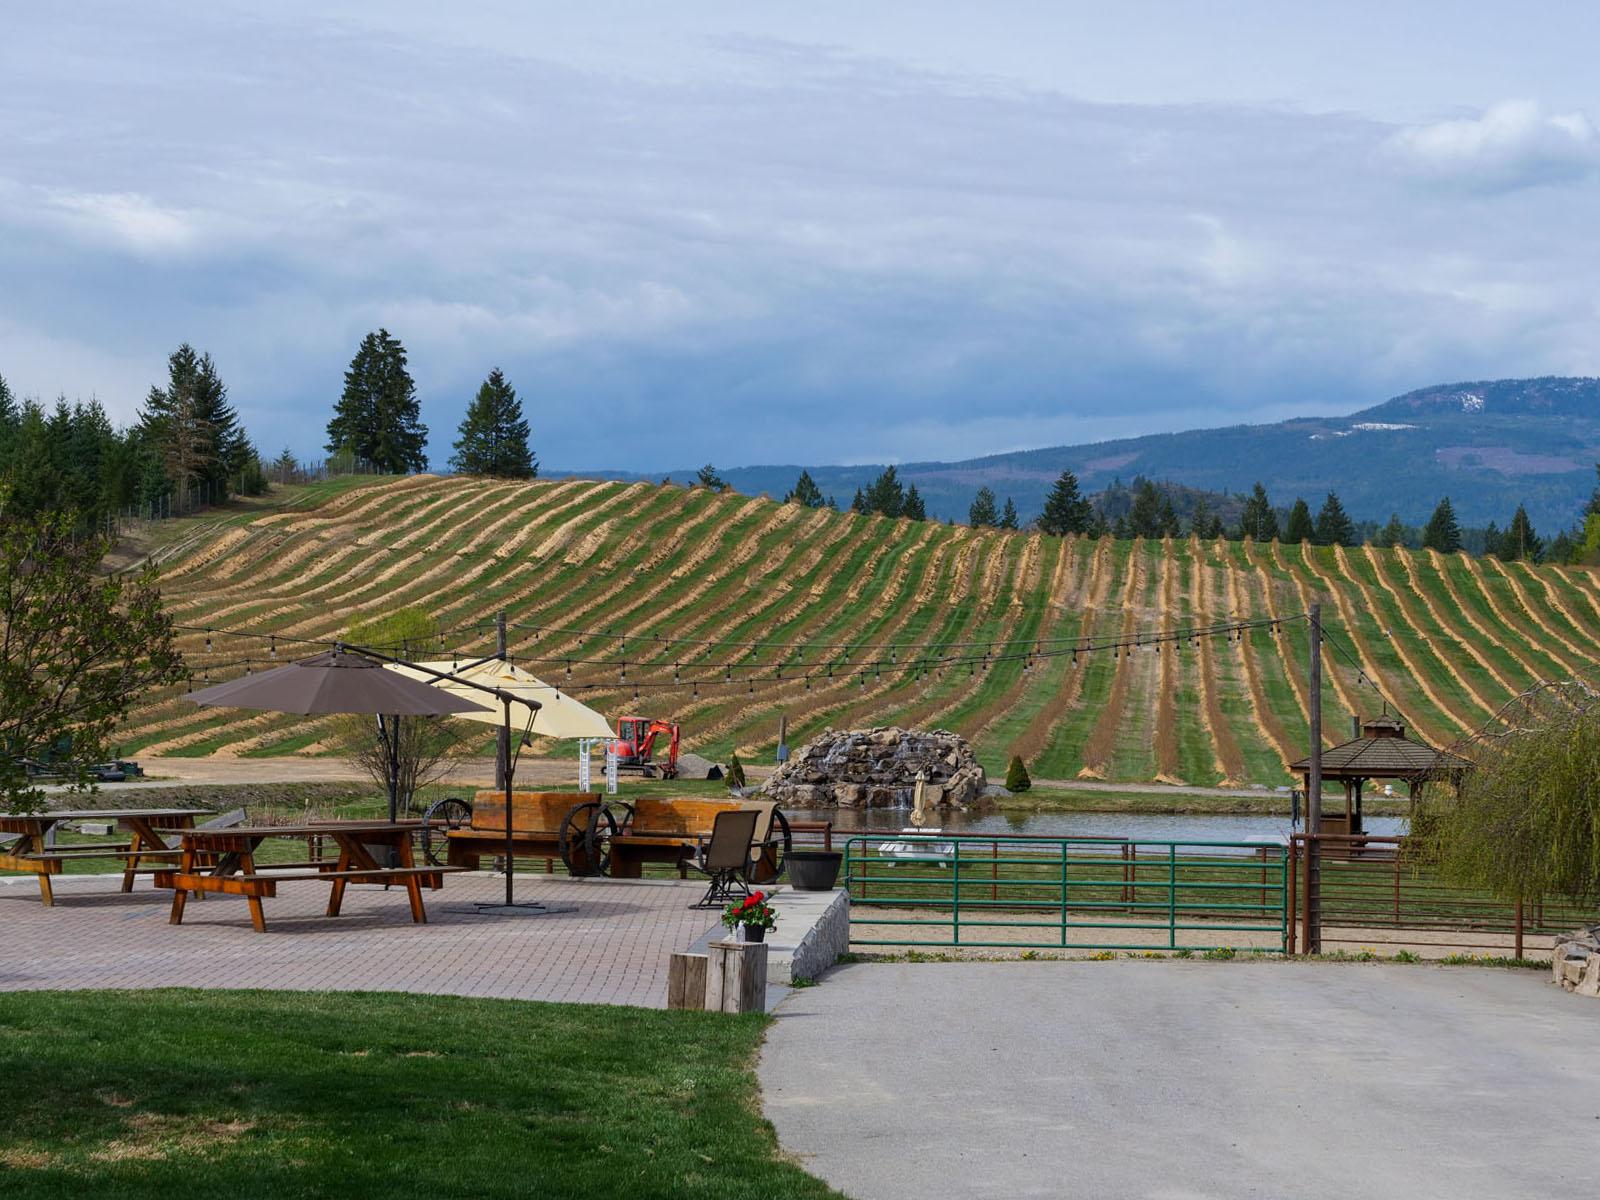 Baccata ridge winery 30